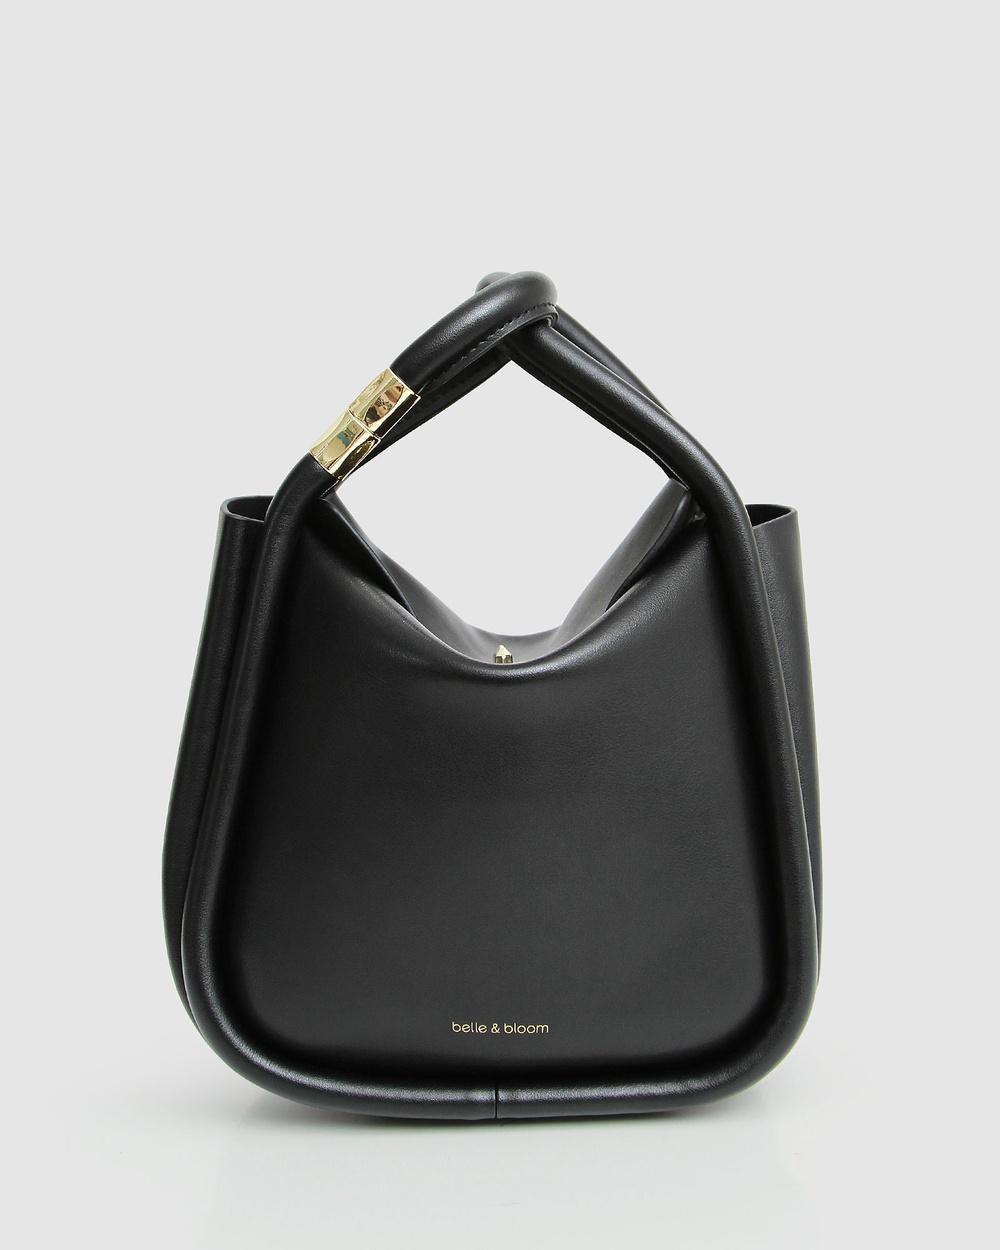 Belle & Bloom Free Soul Leather Handbag Black Handbags Black